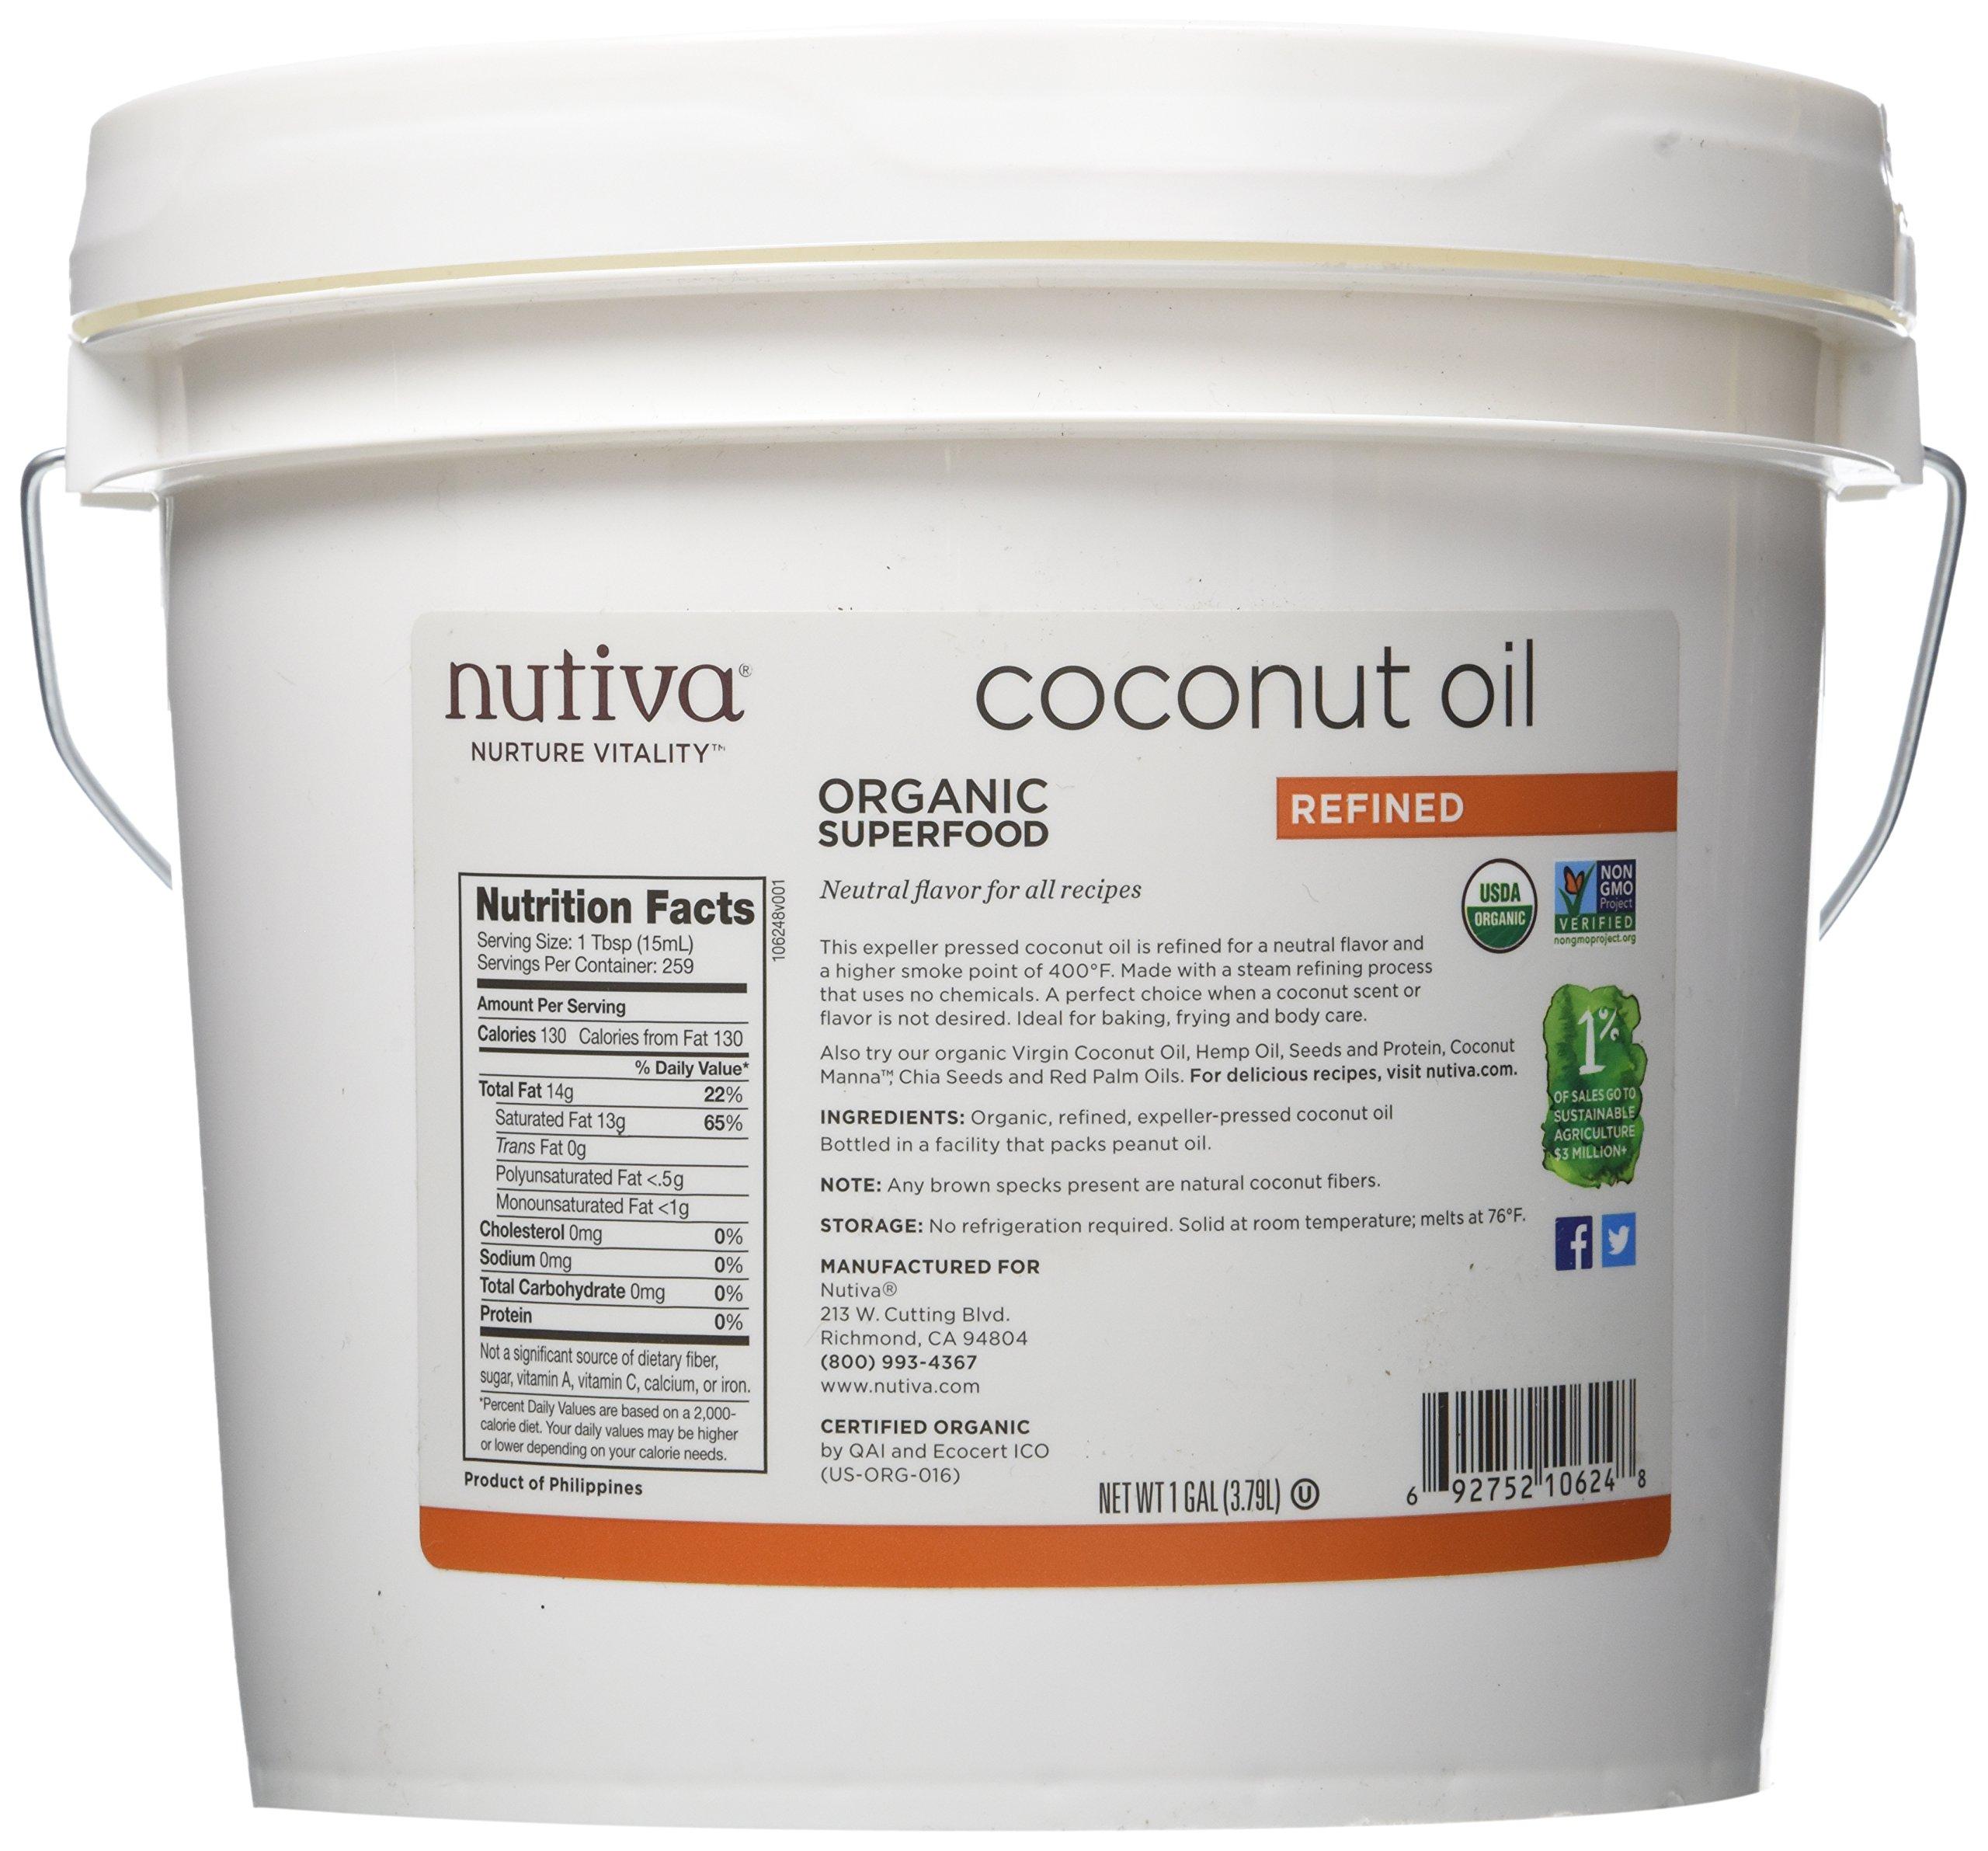 Nutiva Organic, Neutral Tasting, Steam Refined Coconut Oil from non-GMO, Sustainably Farmed Coconuts, 128 Fl Oz